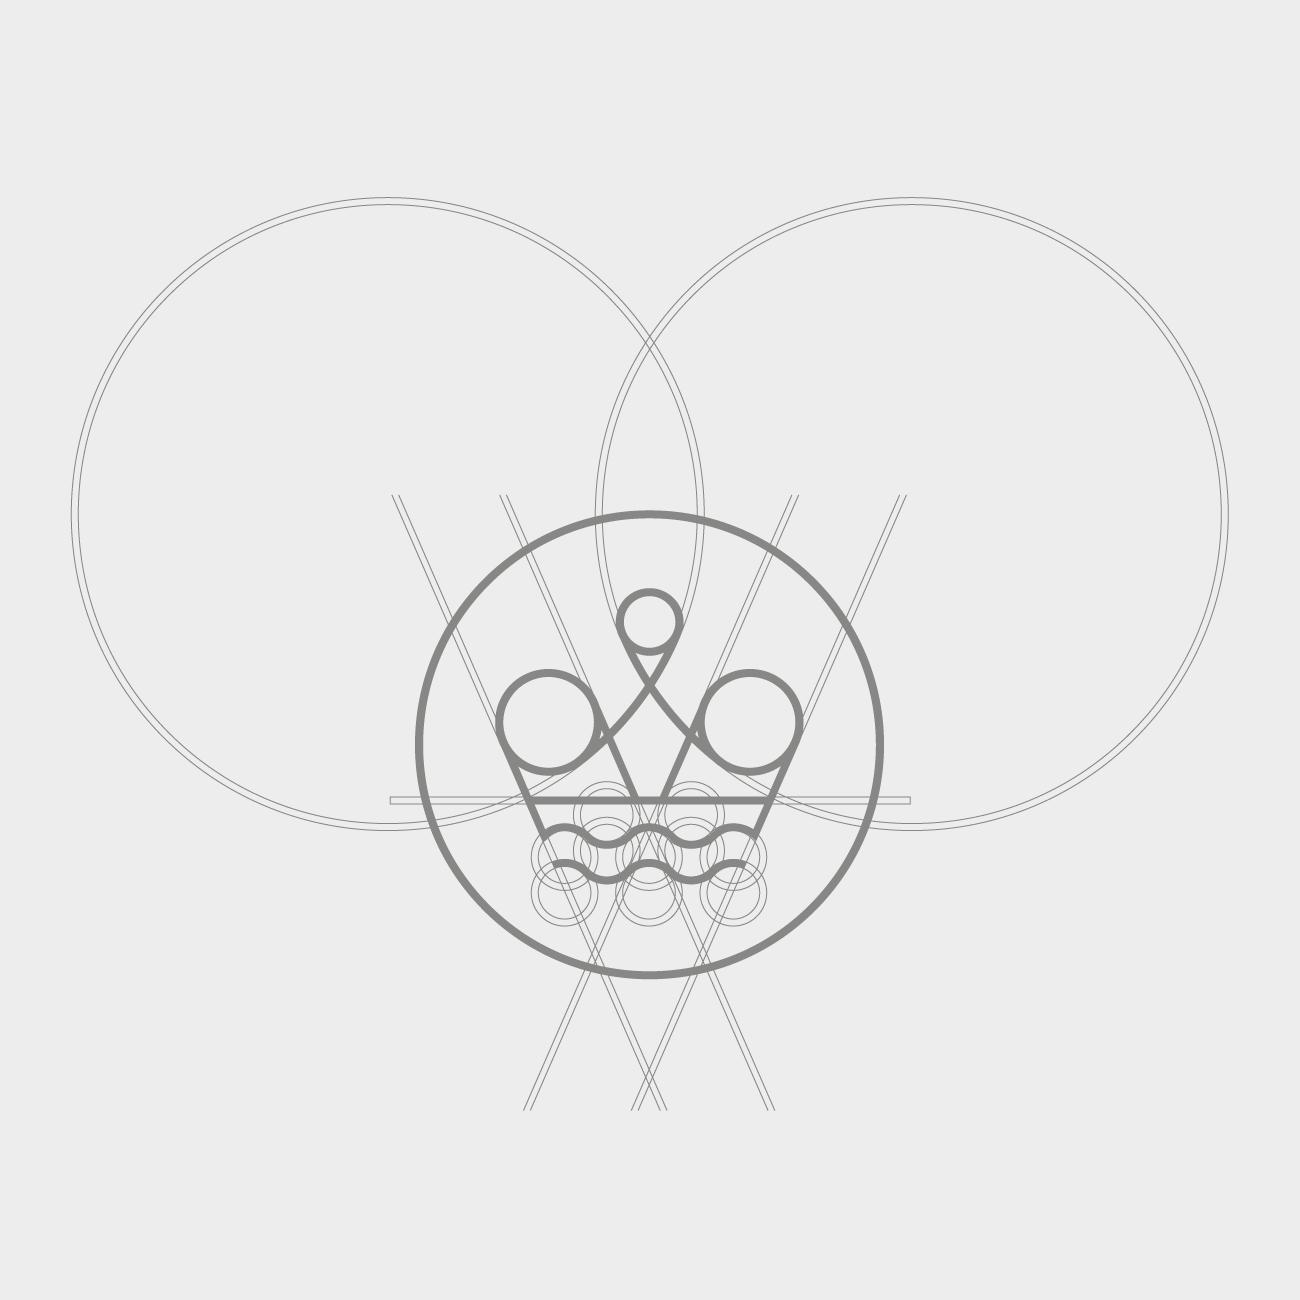 https://www.orlandinifrancesco.com/wp/wp-content/uploads/2019/02/Salento-Deluxe-Logo3.png